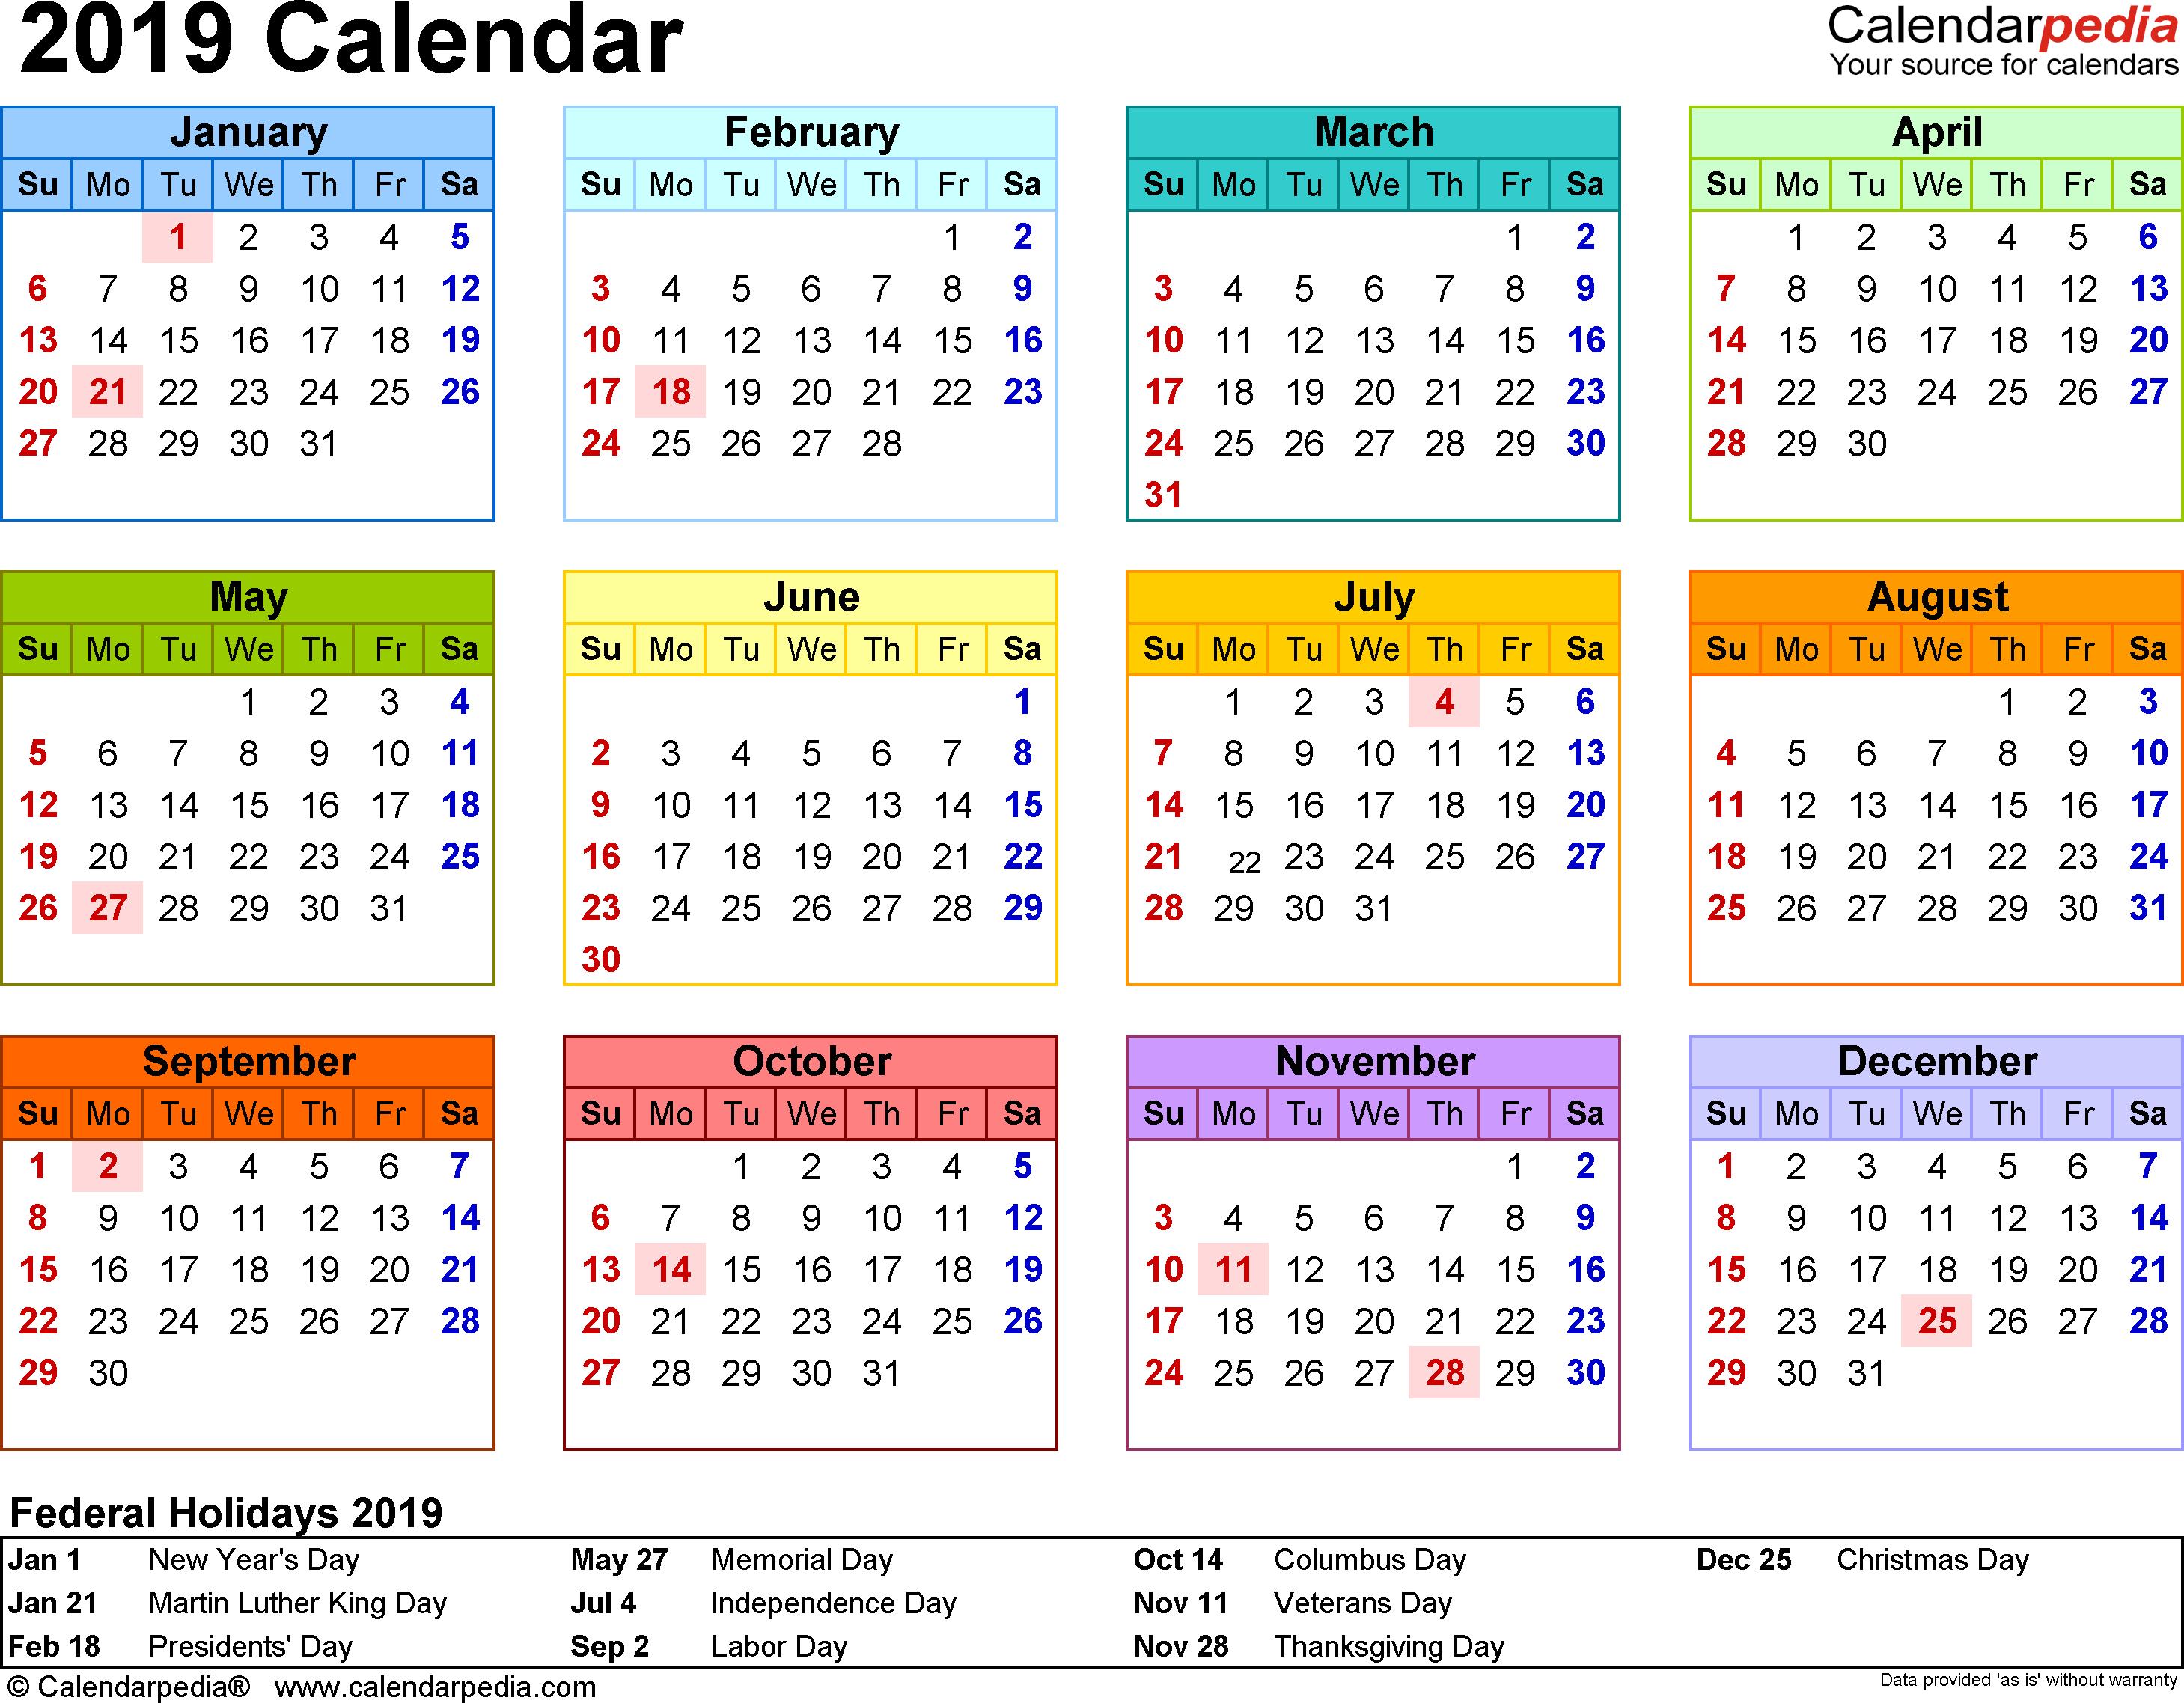 2019 Calendar Template – Free Printable Calendar, Templates And Holidays Calendar 2019 With Holidays Printable